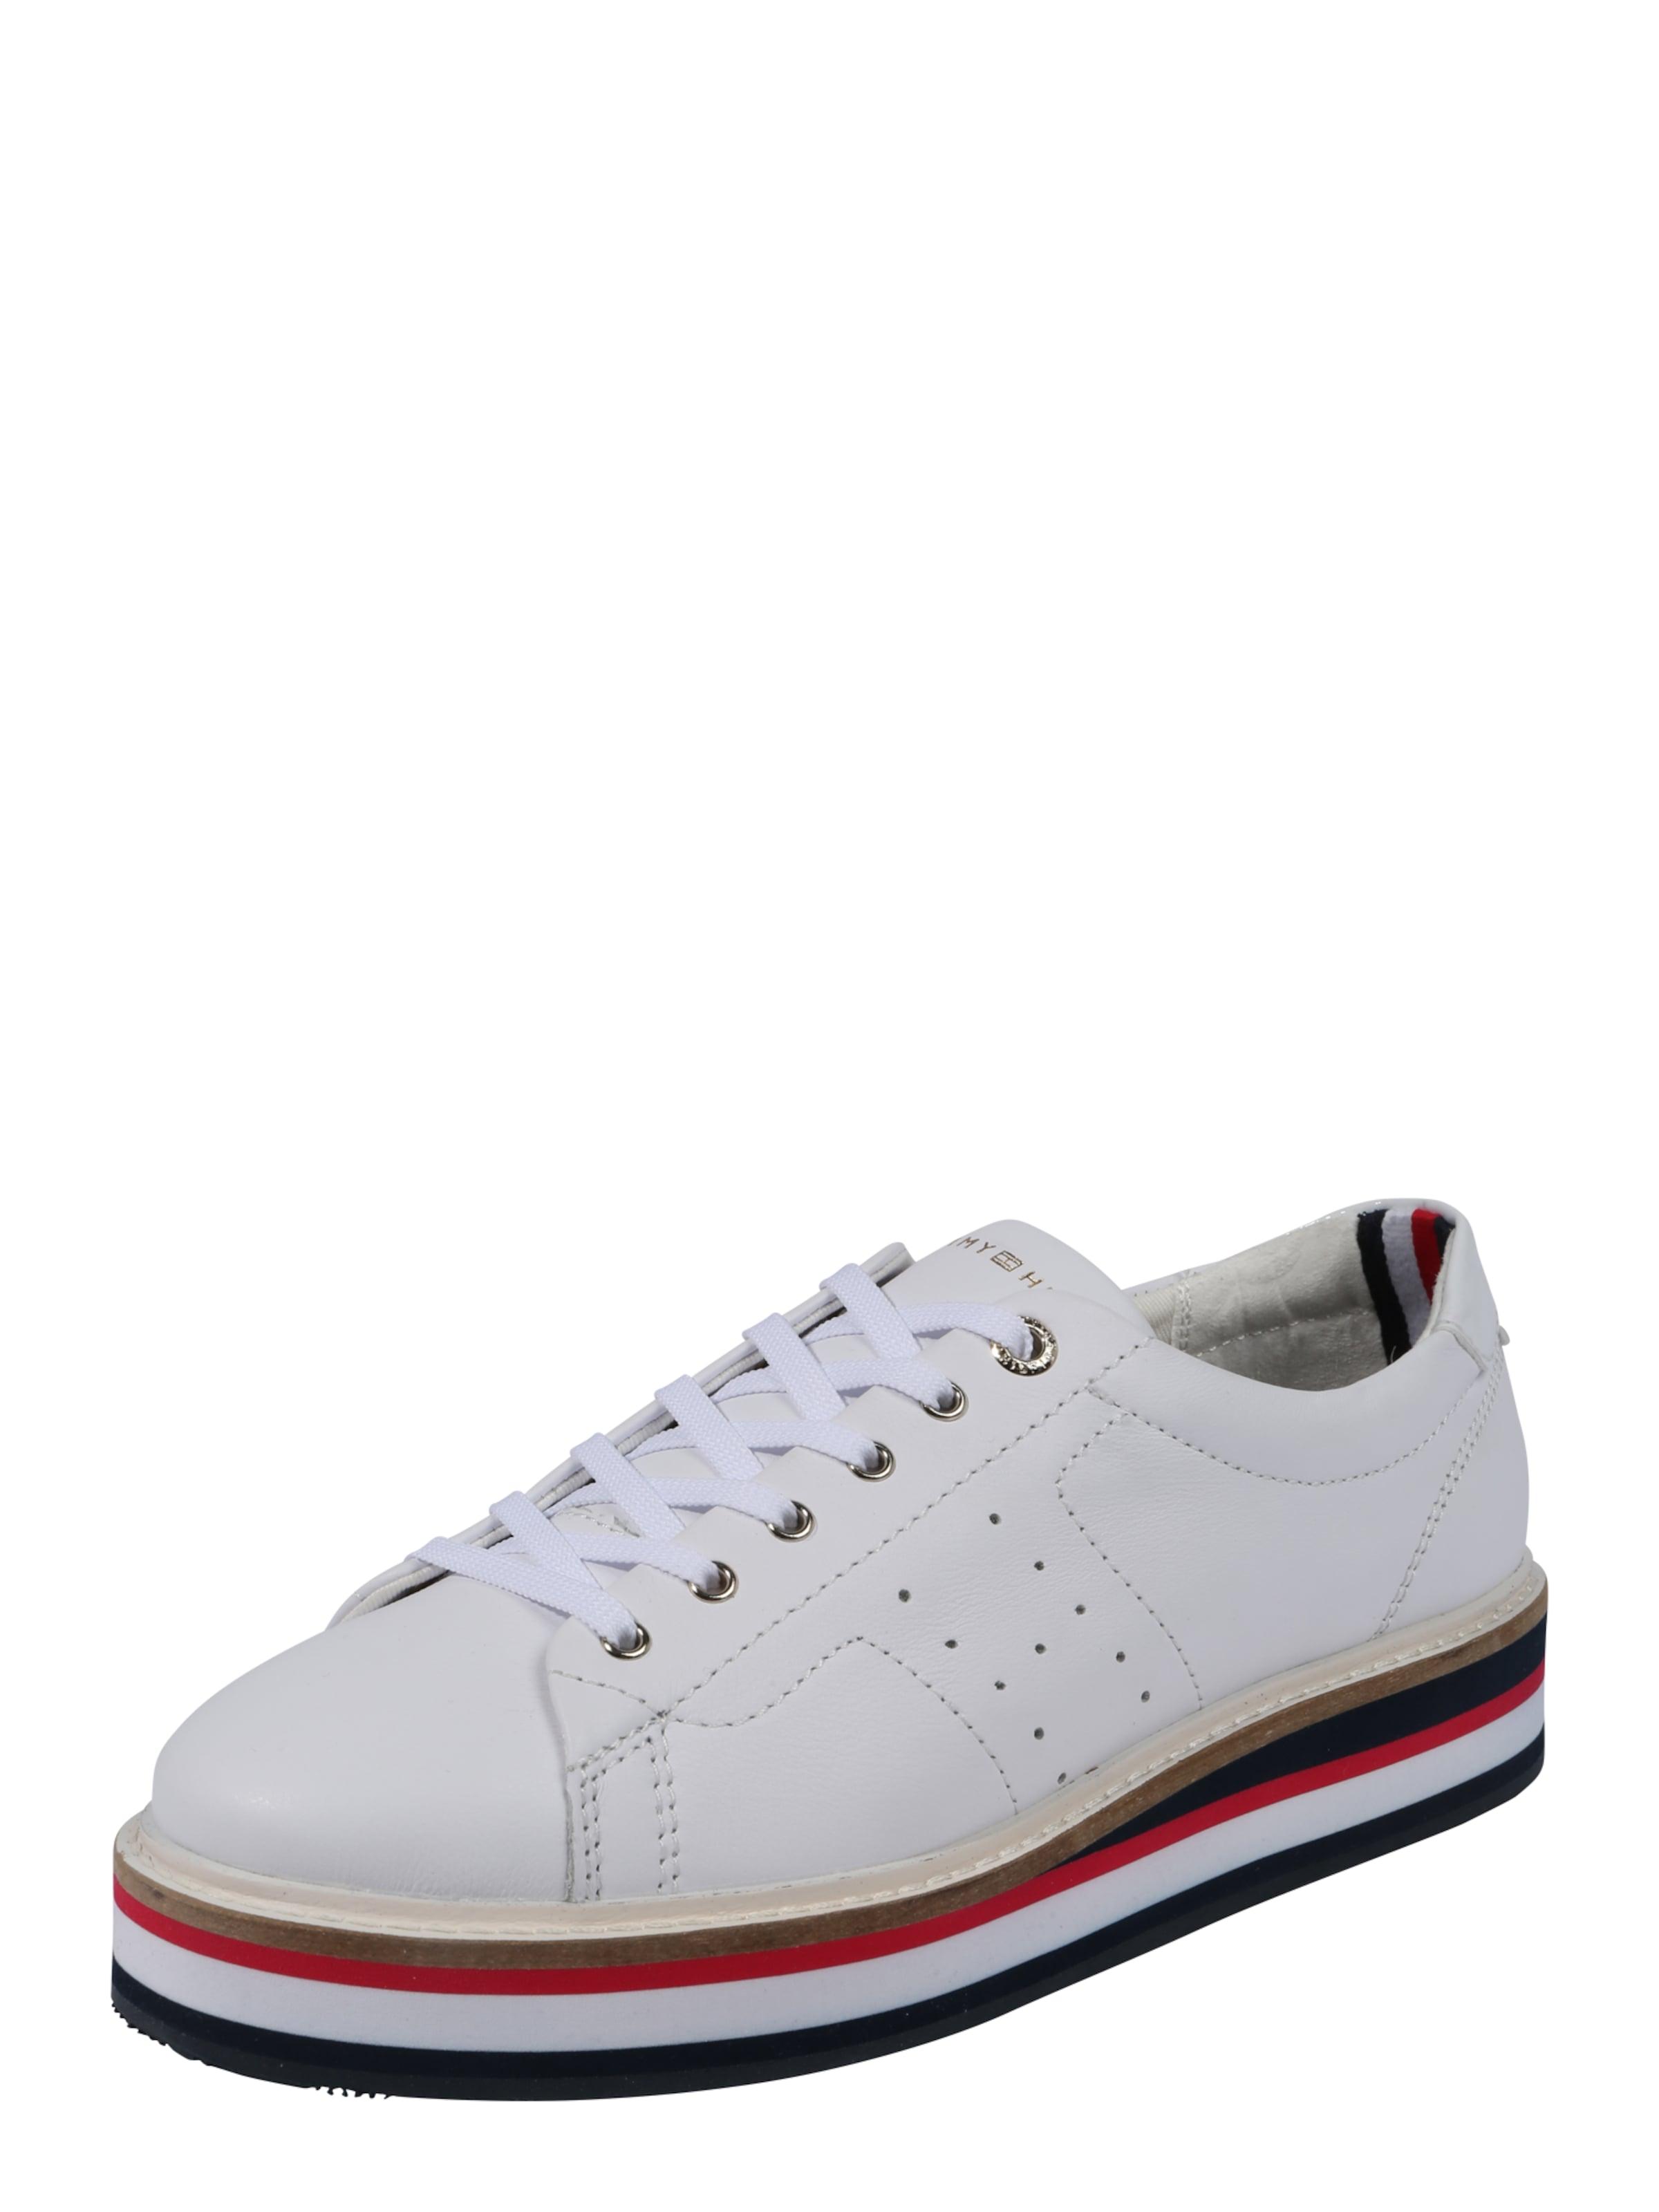 HILFIGER Leder aus Sneaker TOMMY TOMMY HILFIGER Sneaker qnXxA1wYt